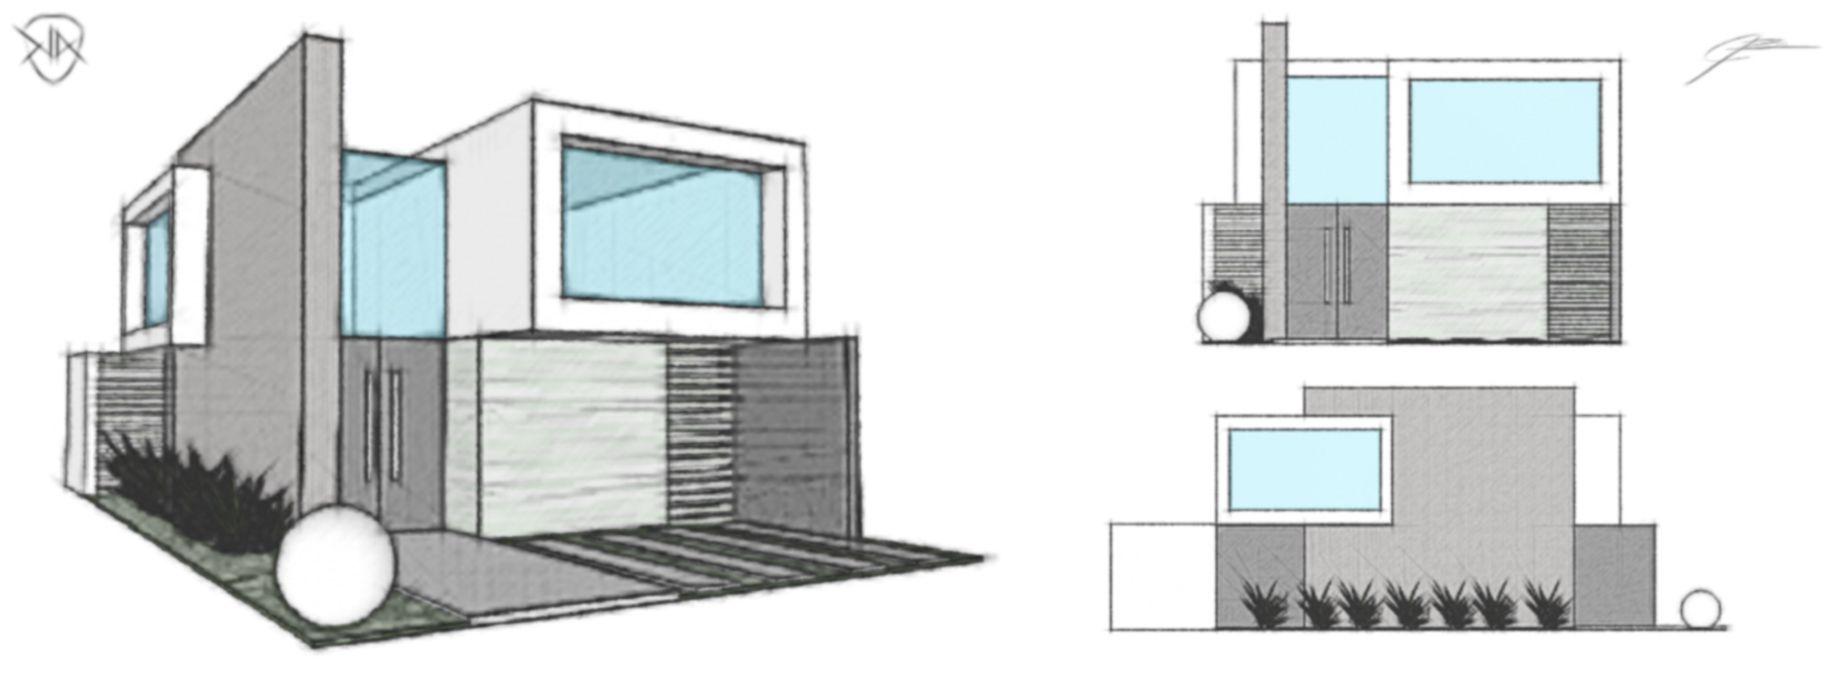 RSI T House Conceptual